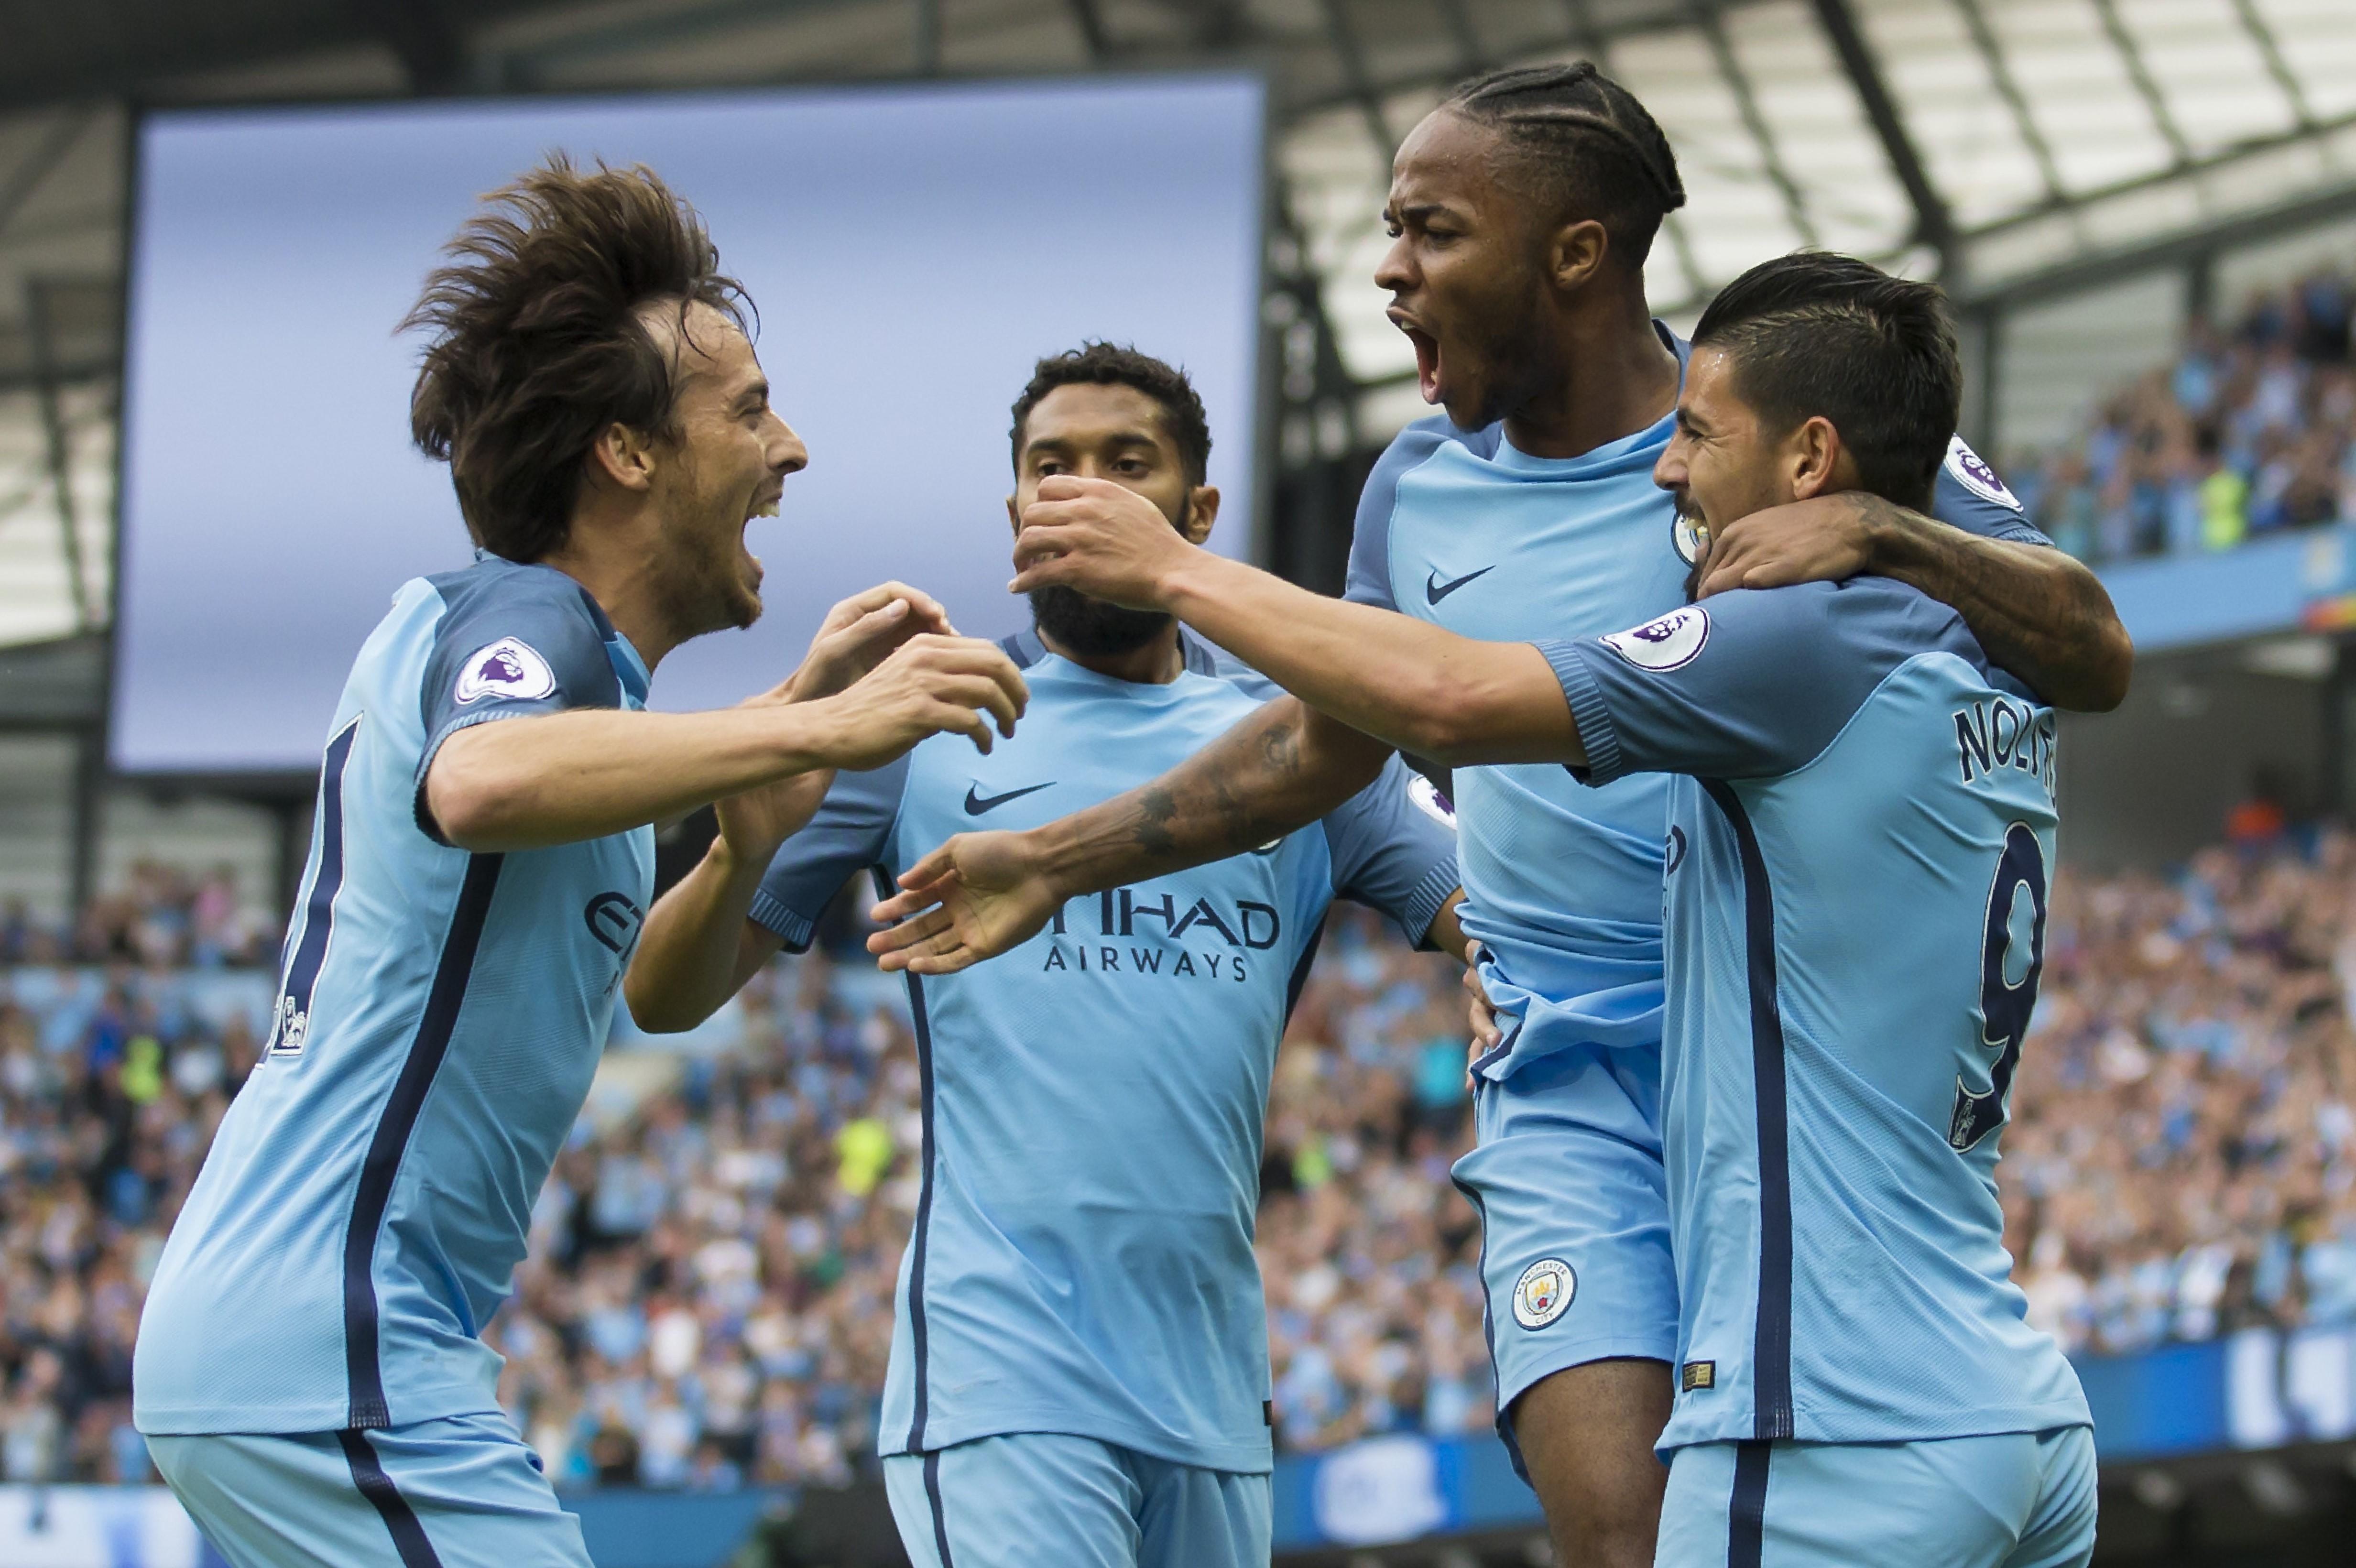 «Манчестер Сити» обыграл «Вест Хэм» втретьем туре чемпионата Британии